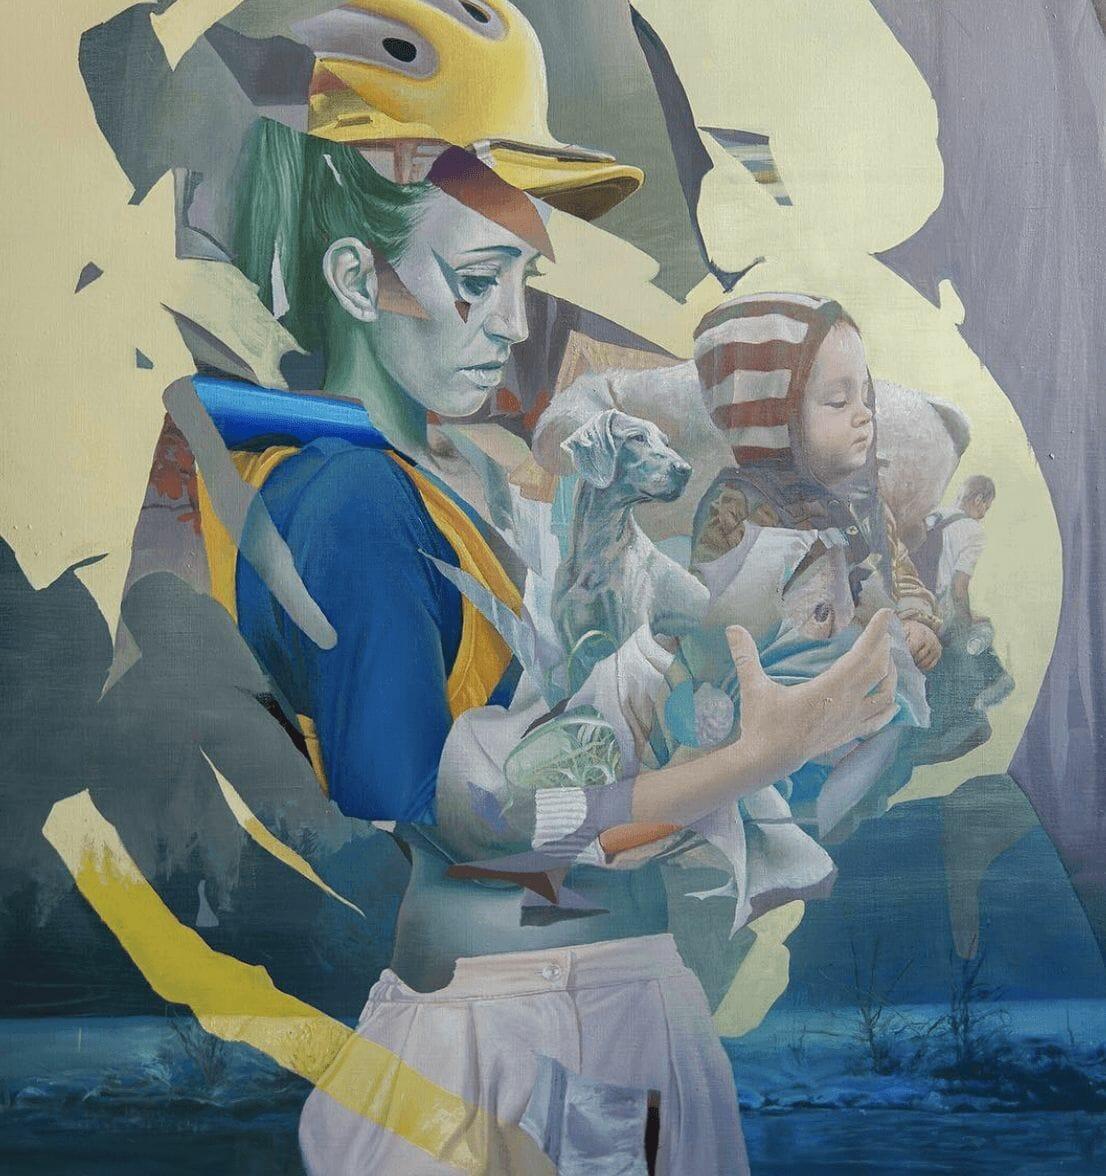 Grande fresque murale par Telmo Miel